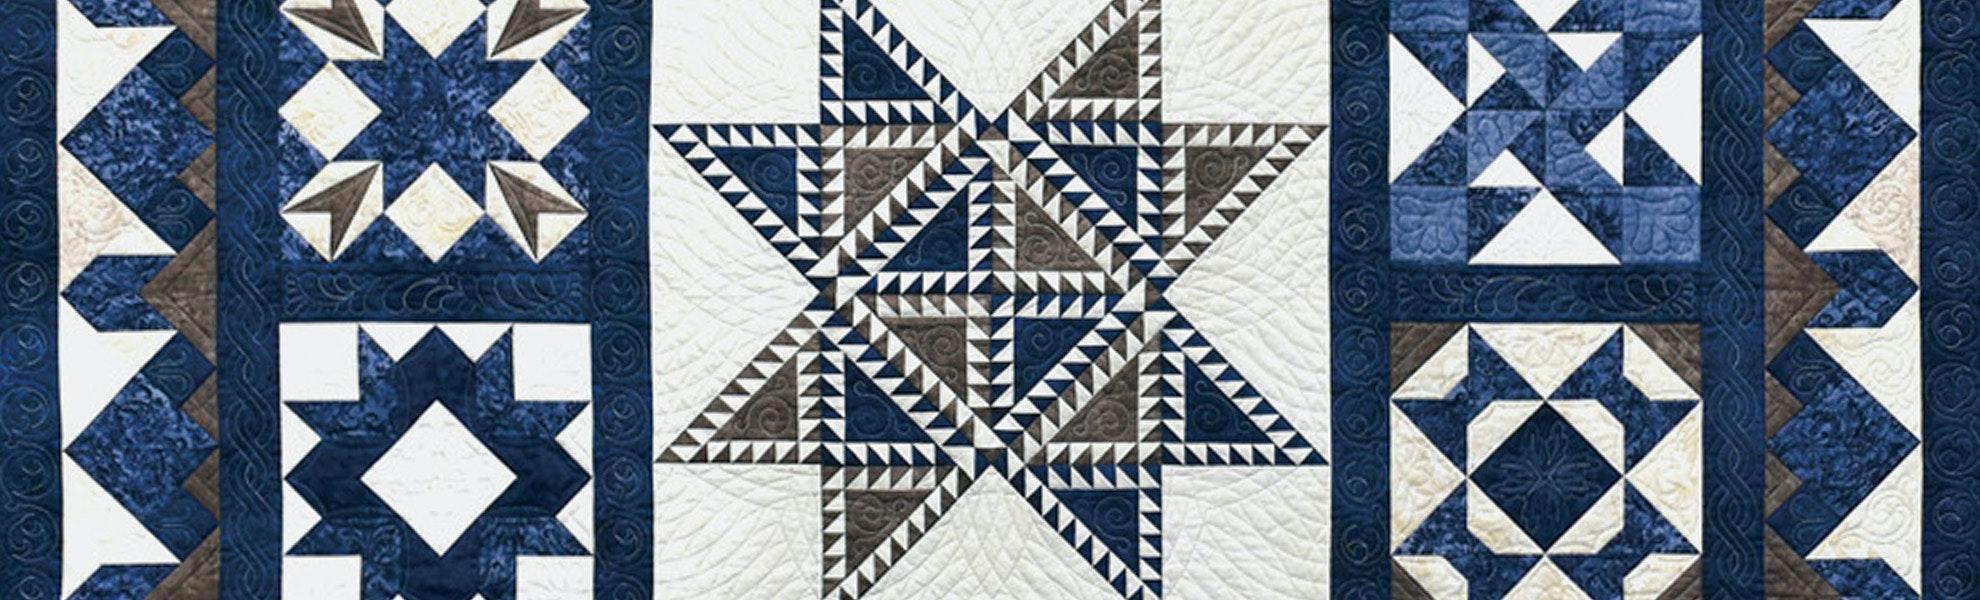 Star Spangled BOM Pattern